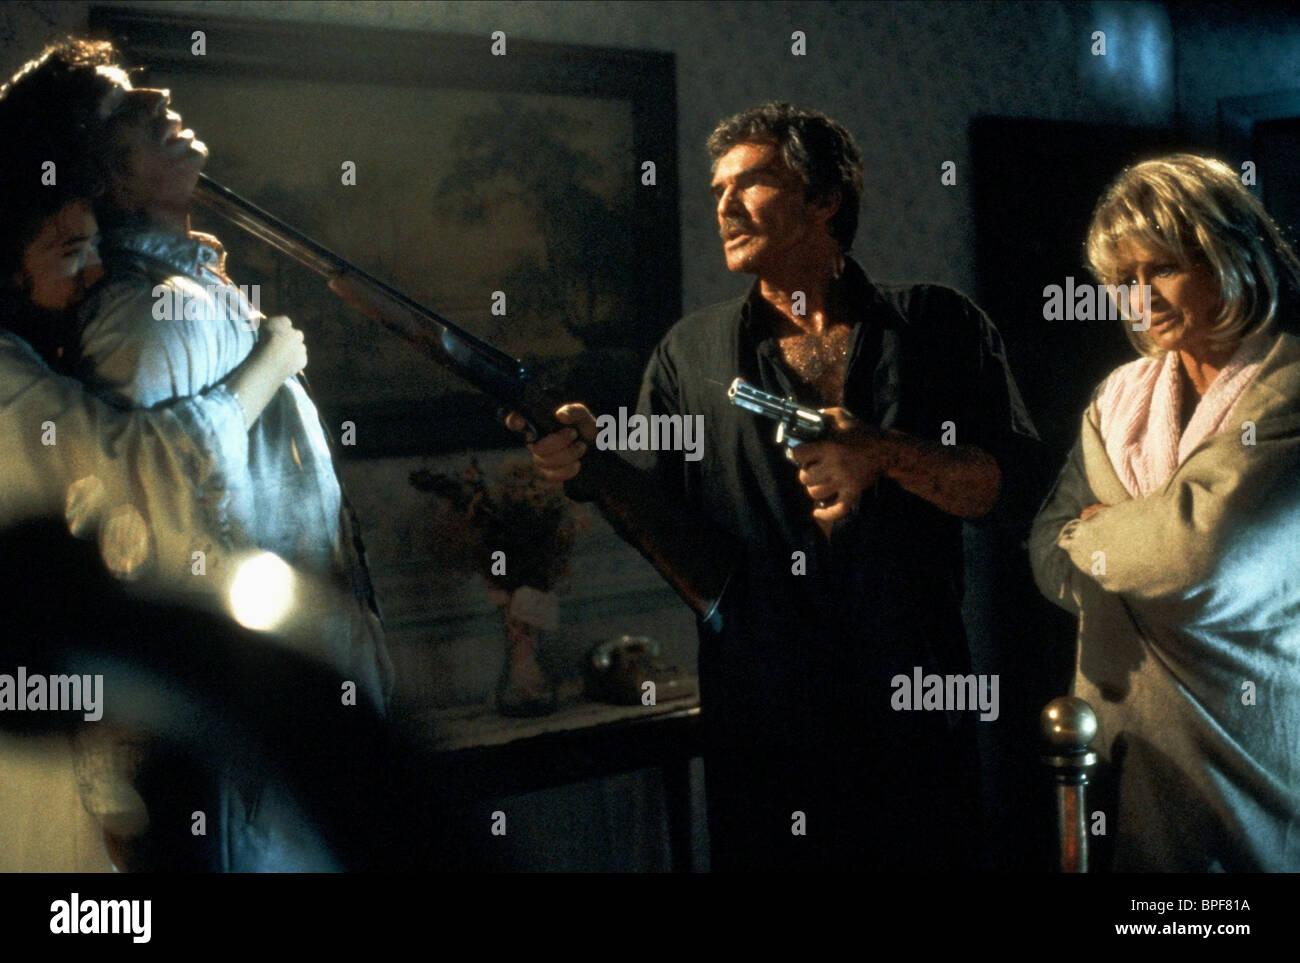 MIA SARA, BRIAN WIMMER, BURT REYNOLDS, ANGIE DICKINSON, THE MADDENING, 1995 - Stock Image